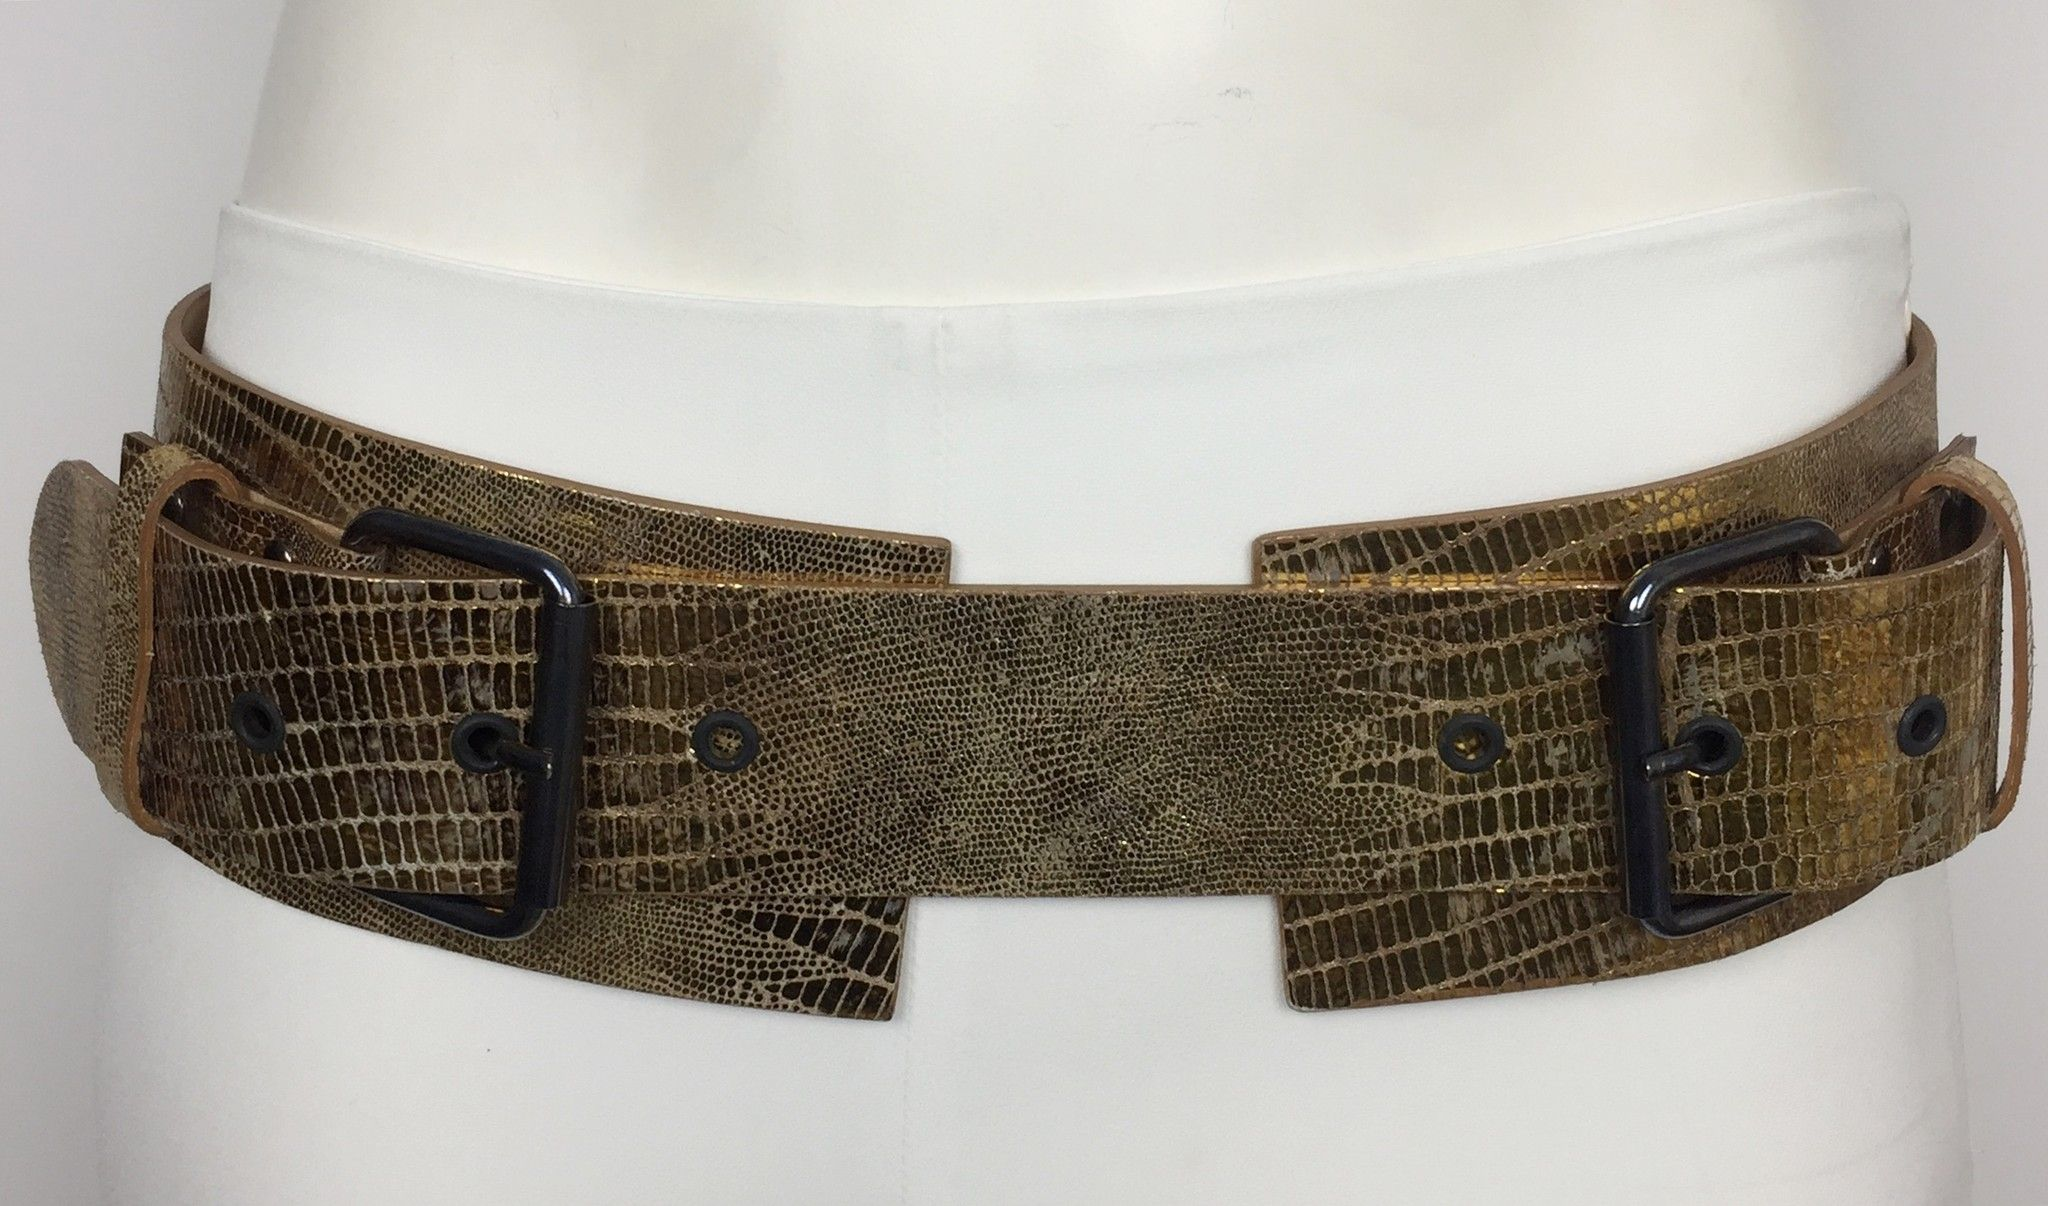 Adele Fado Printed Belt Cod.9746513